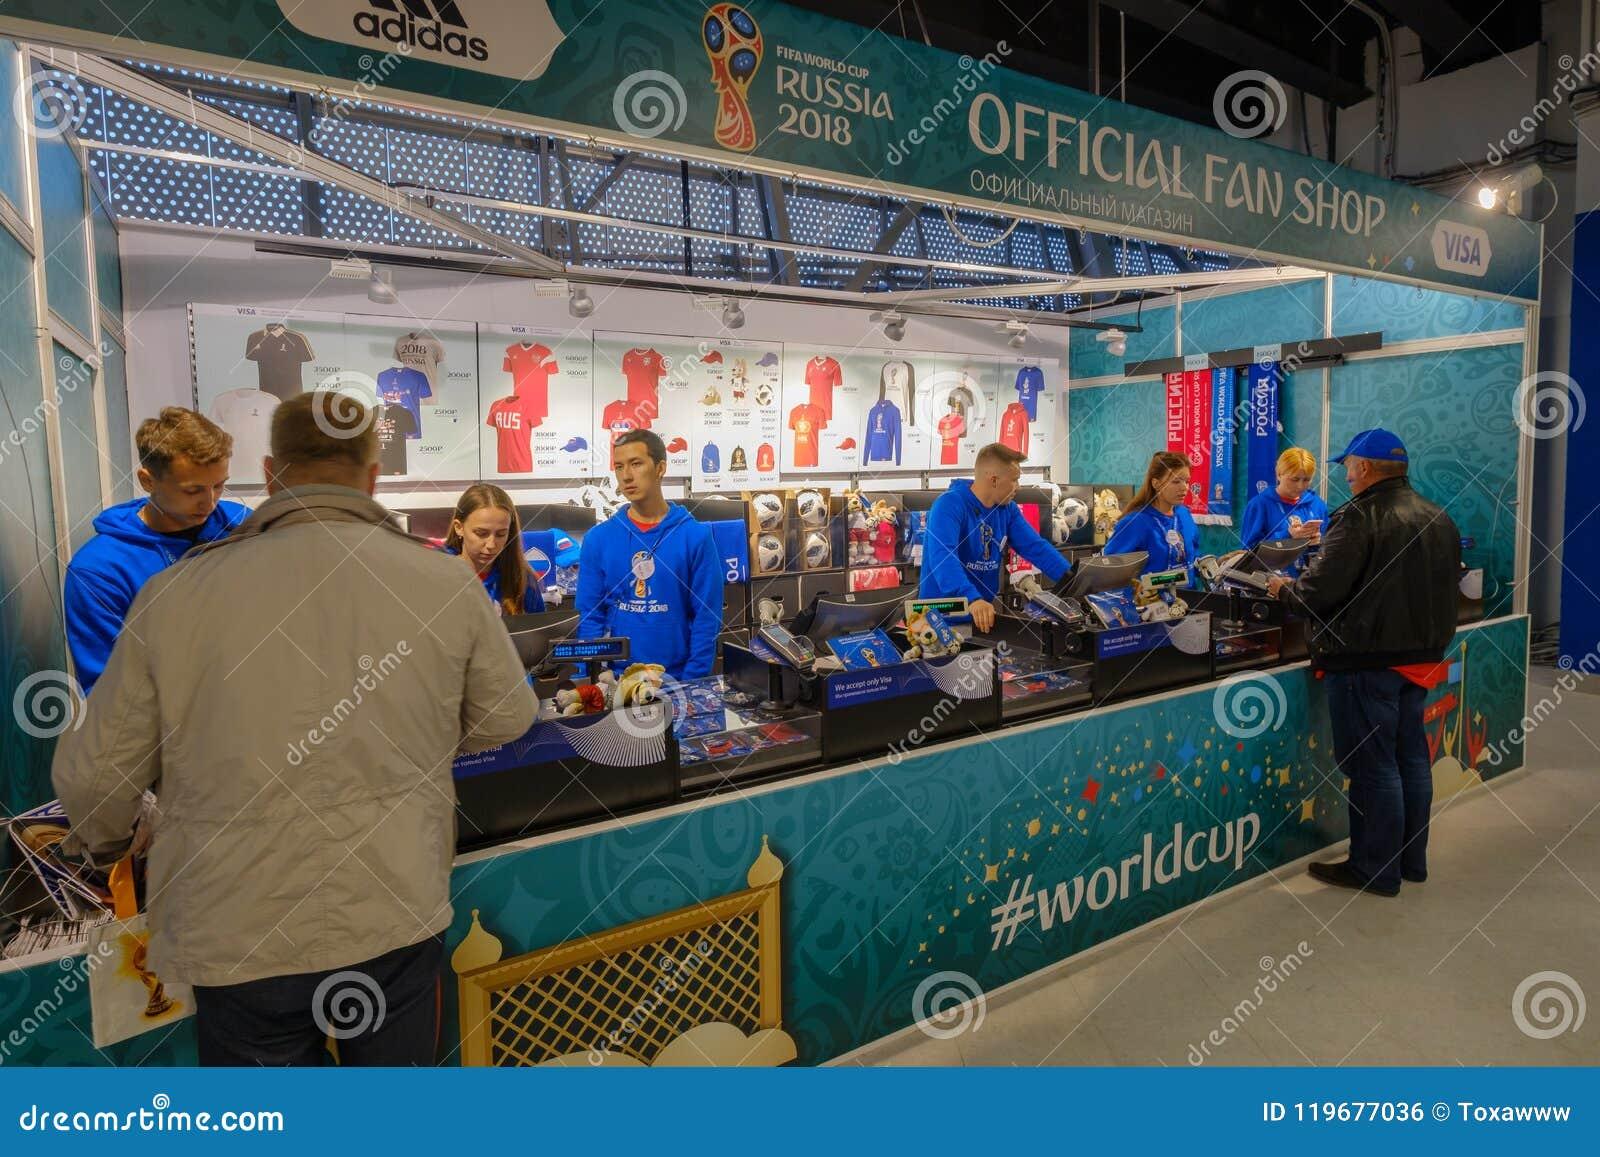 Football Bying Souvenirs At Official Shop In Stadion Kaliningrad